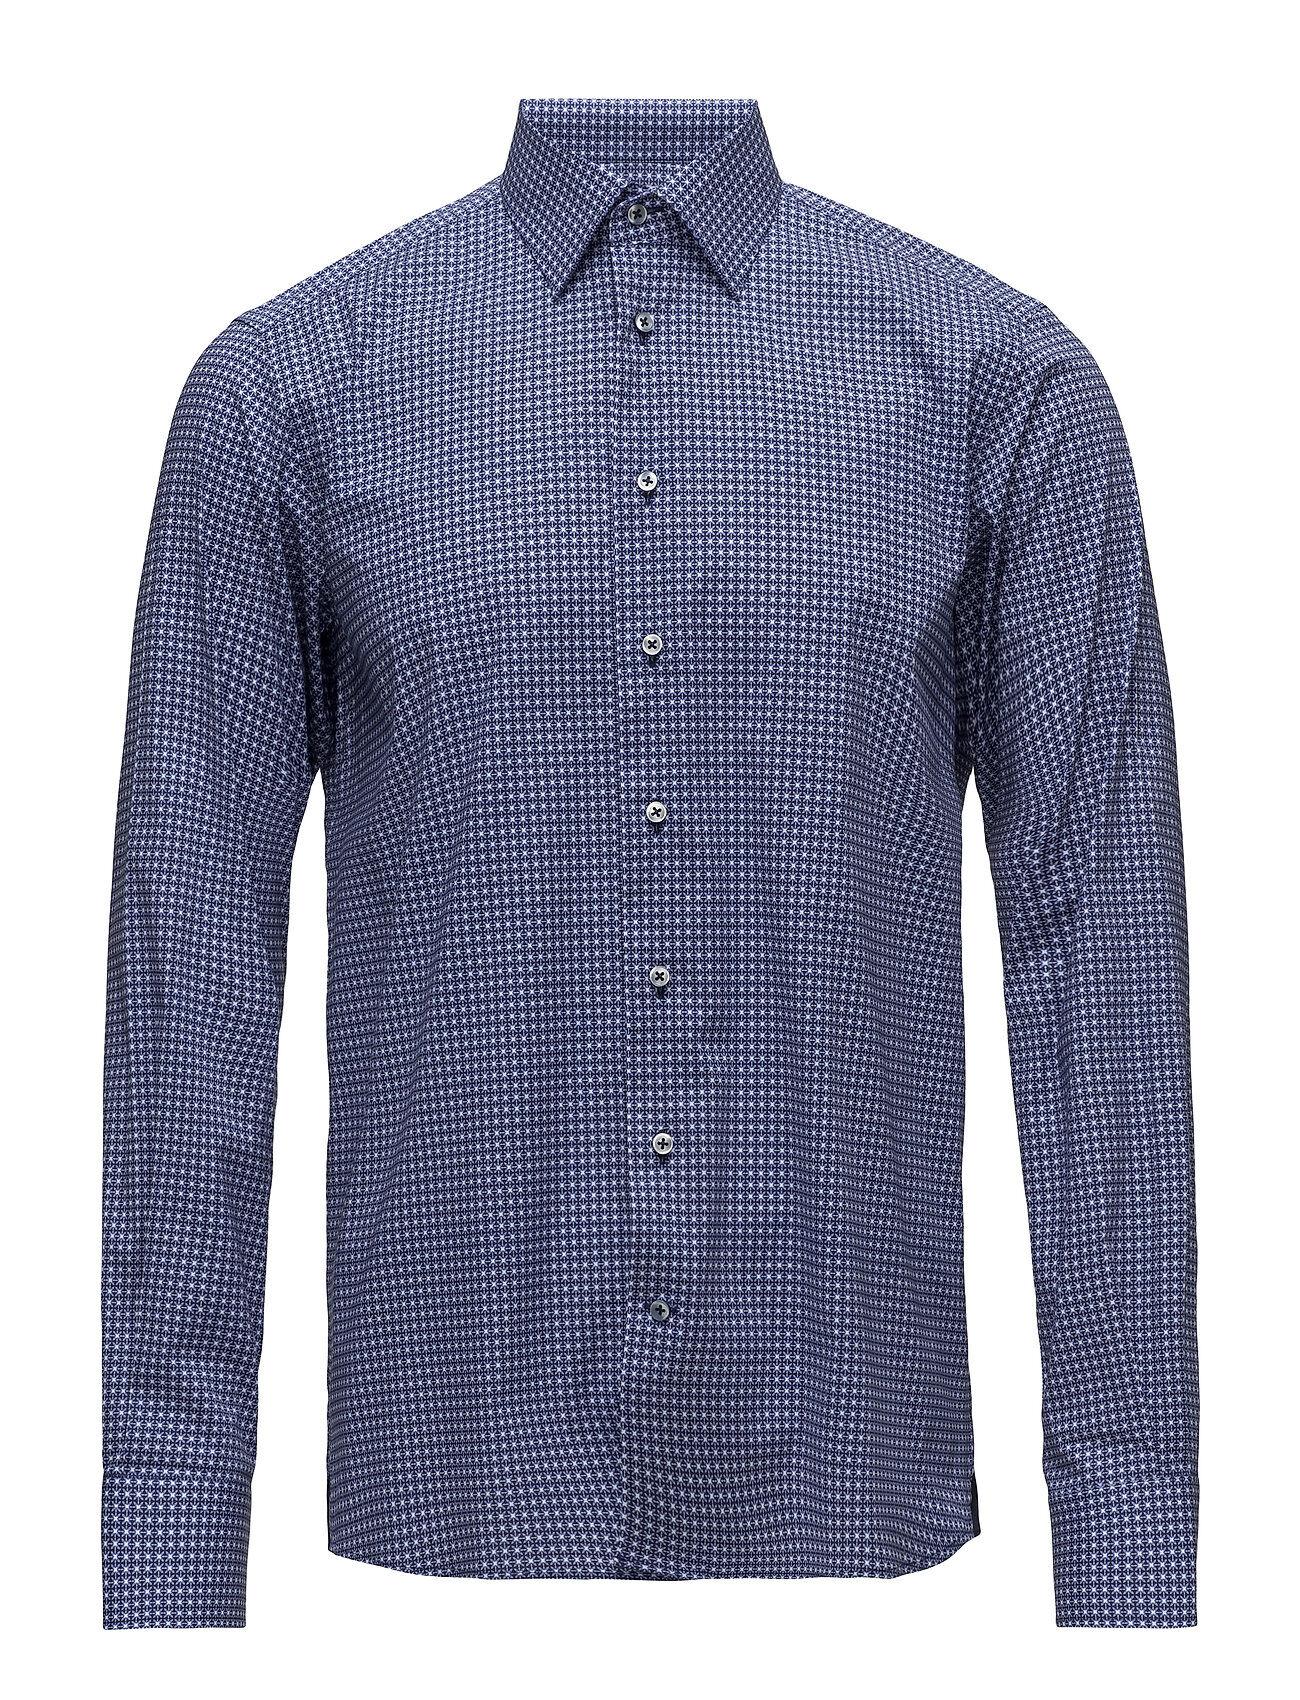 XO Shirtmaker by Sand Copenhagen 8002 - Gordon Sc